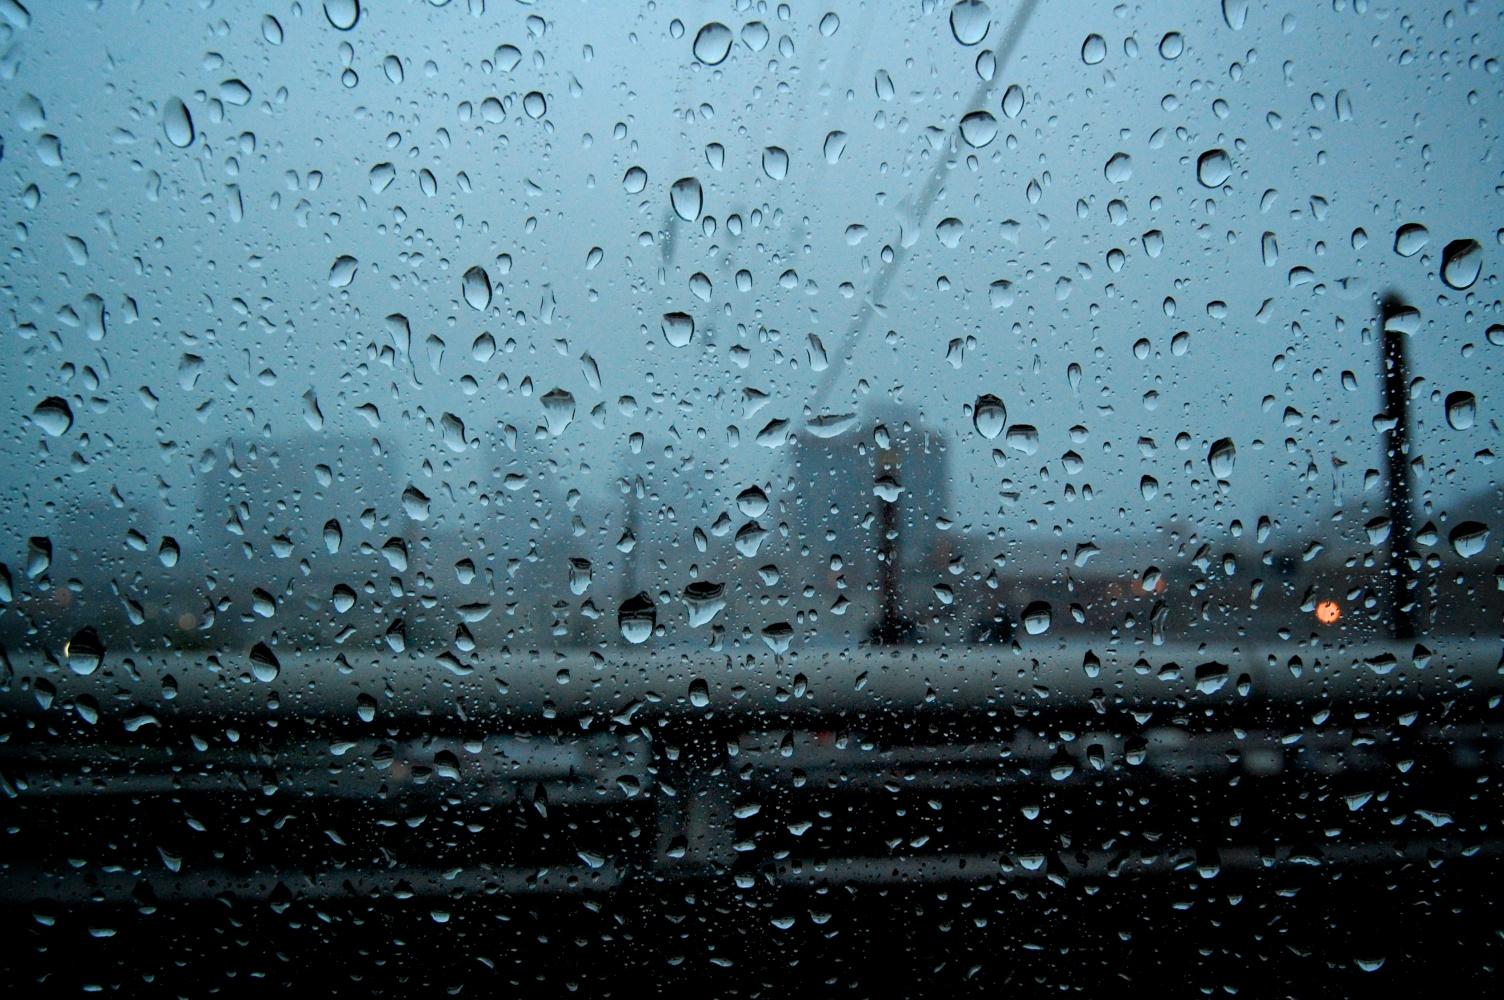 nashville through the rain